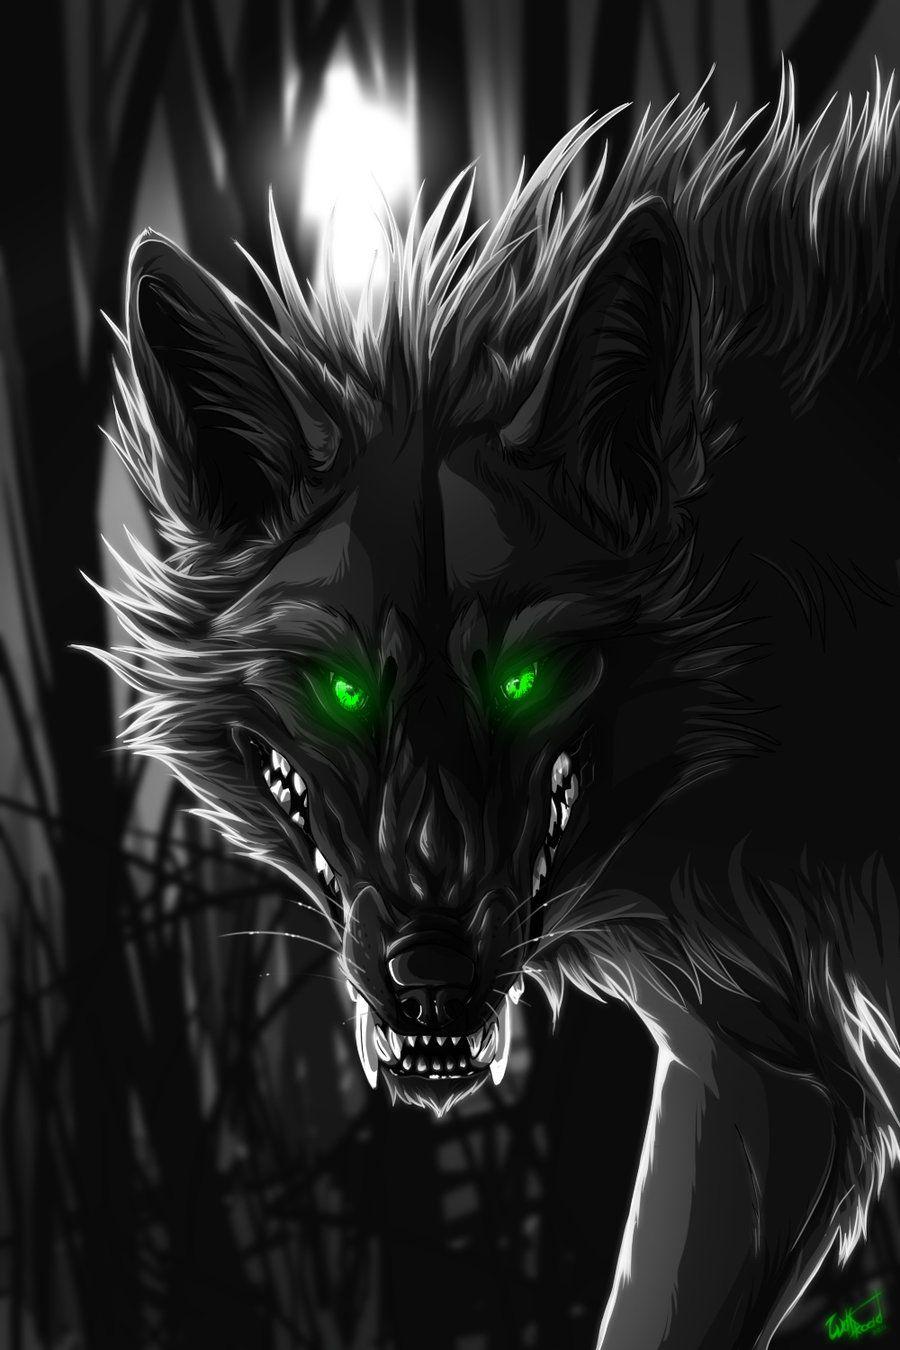 Black Hide by on DeviantArt